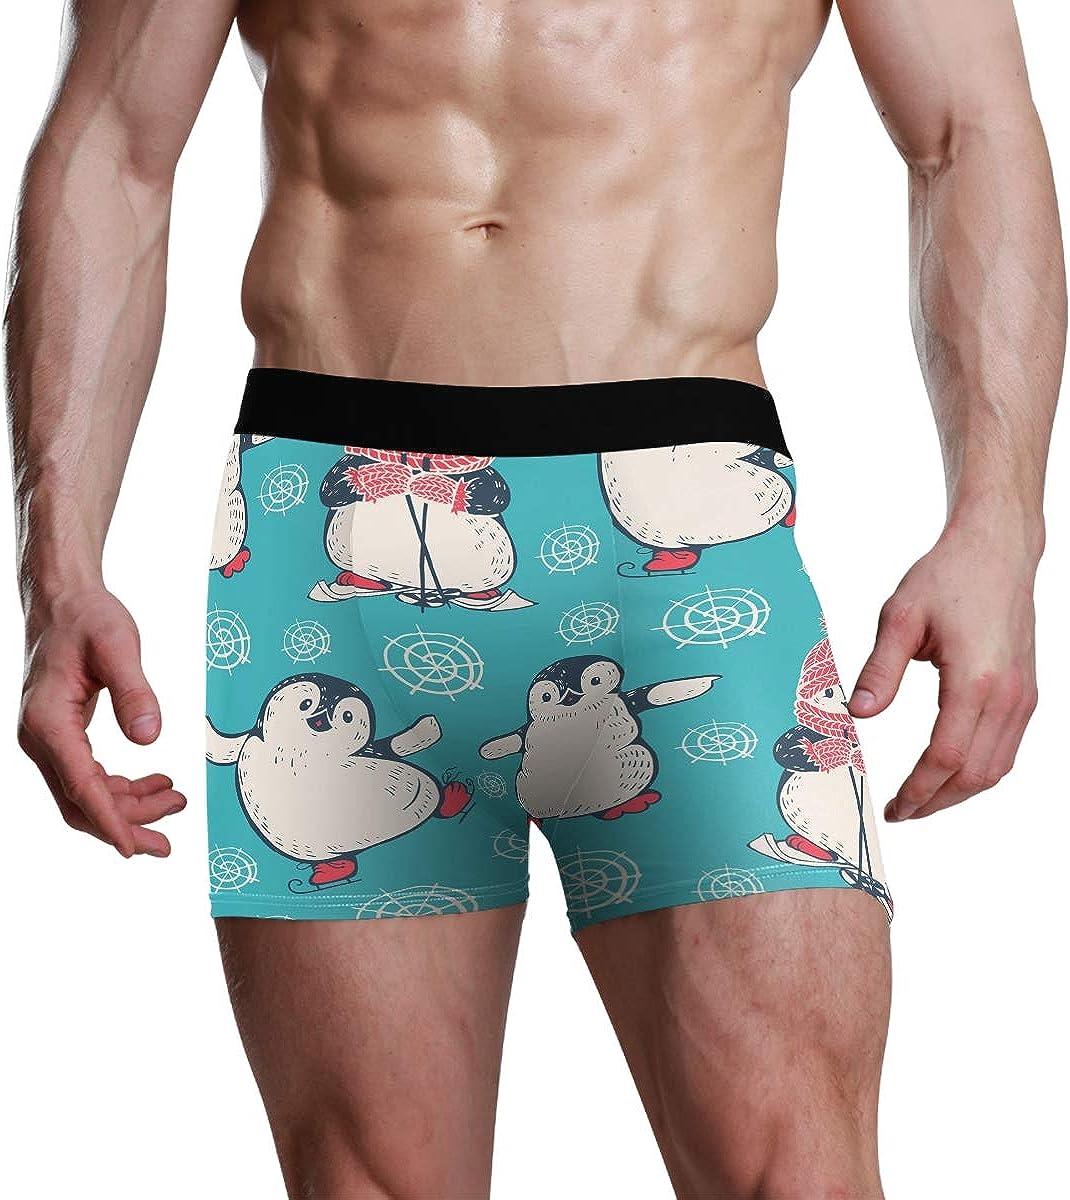 Mens Boxer Briefs Underwear Cute Penguin Snowflake Trunks Underwear Short Leg Boys